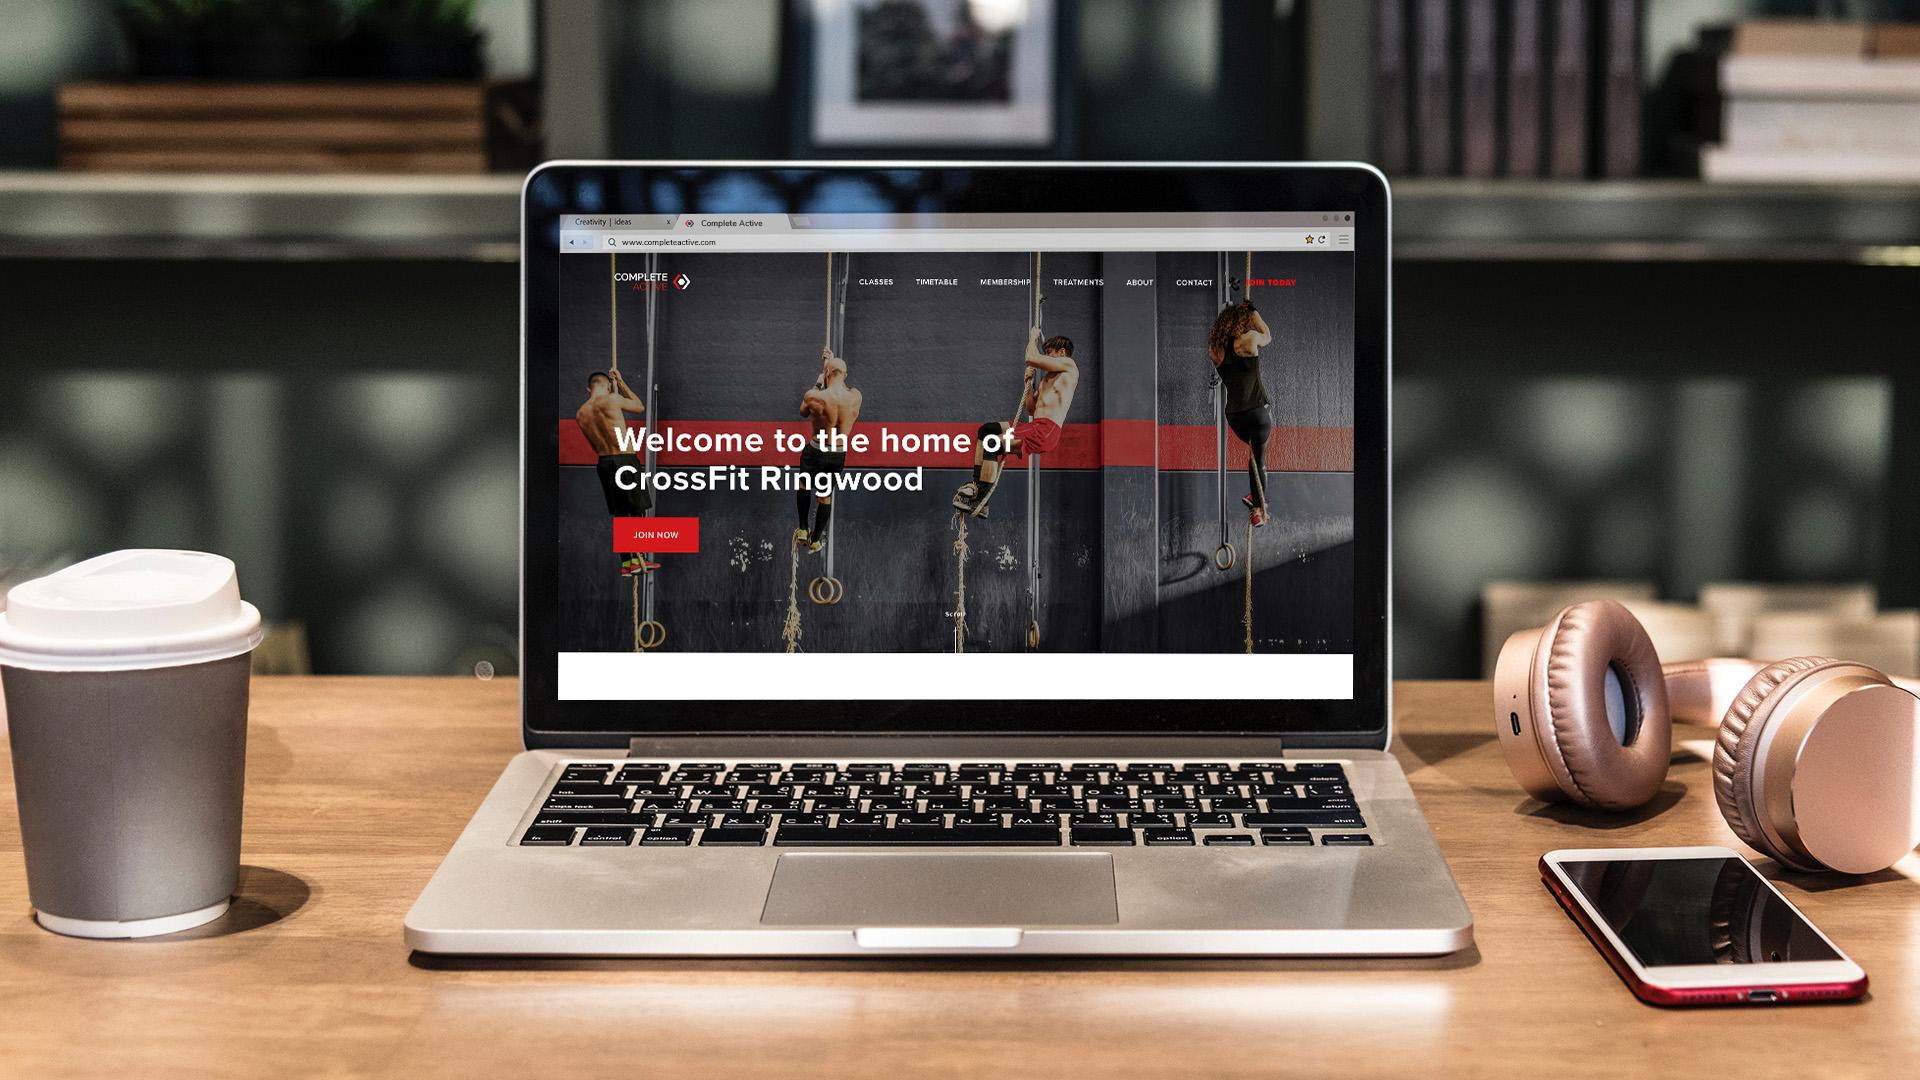 02-Lobo-Creative-Complete-Active-digital-website-design-development-in-Bournemouth.jpg